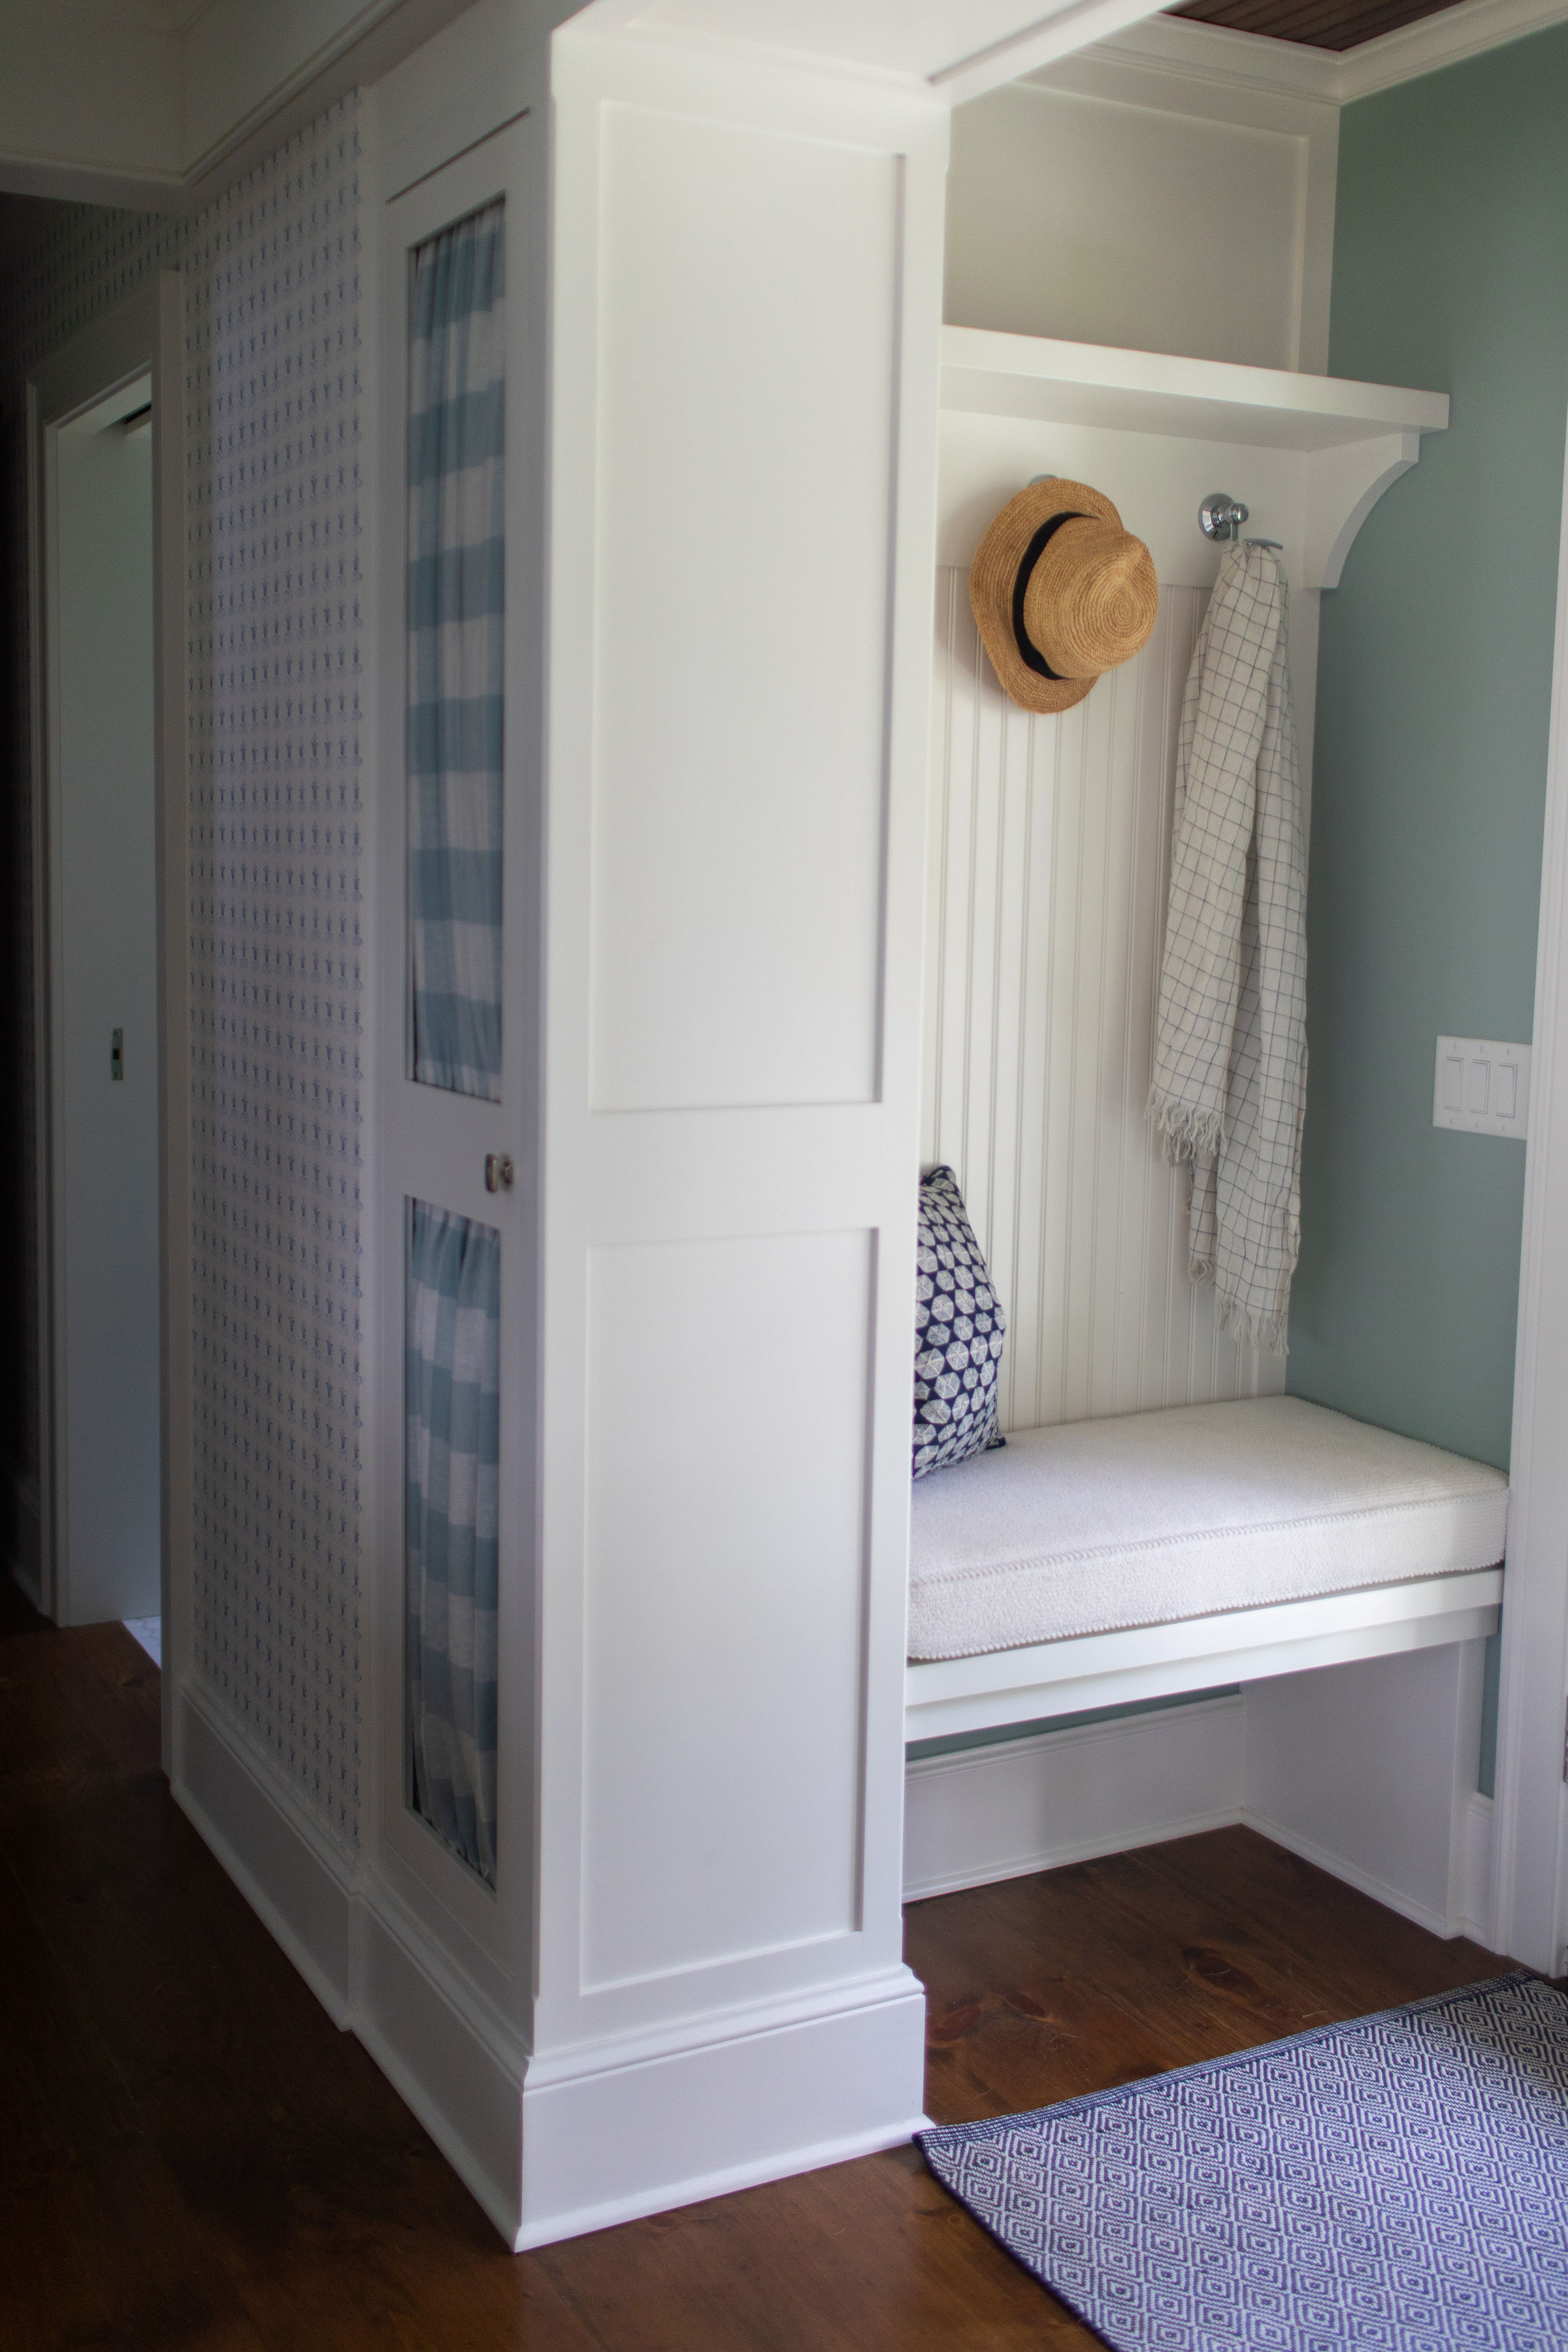 Built in storage ideas by Teaselwood Design, Skaneateles New York interior designer